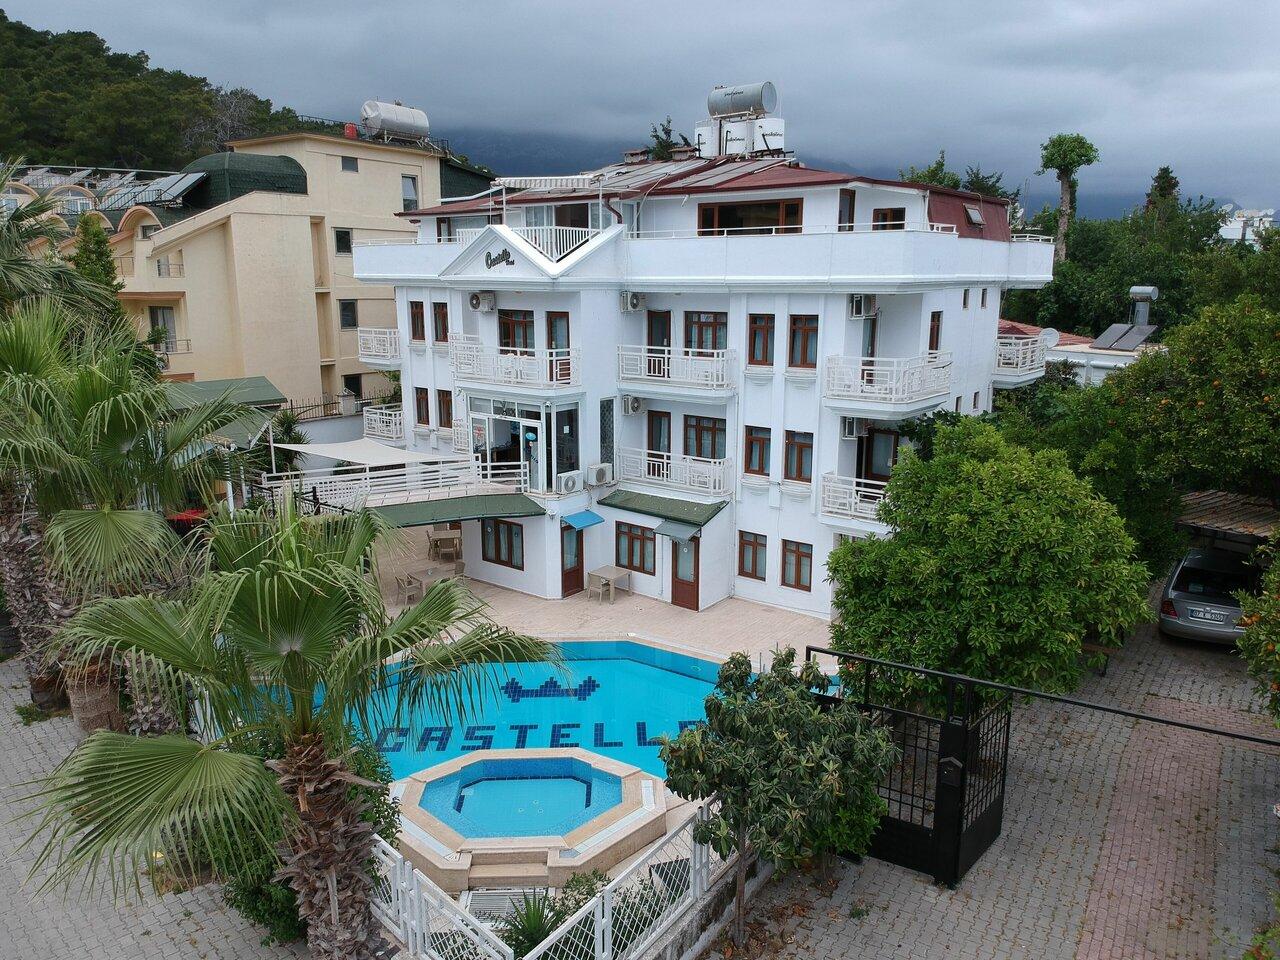 Castello Hotel And Aparts